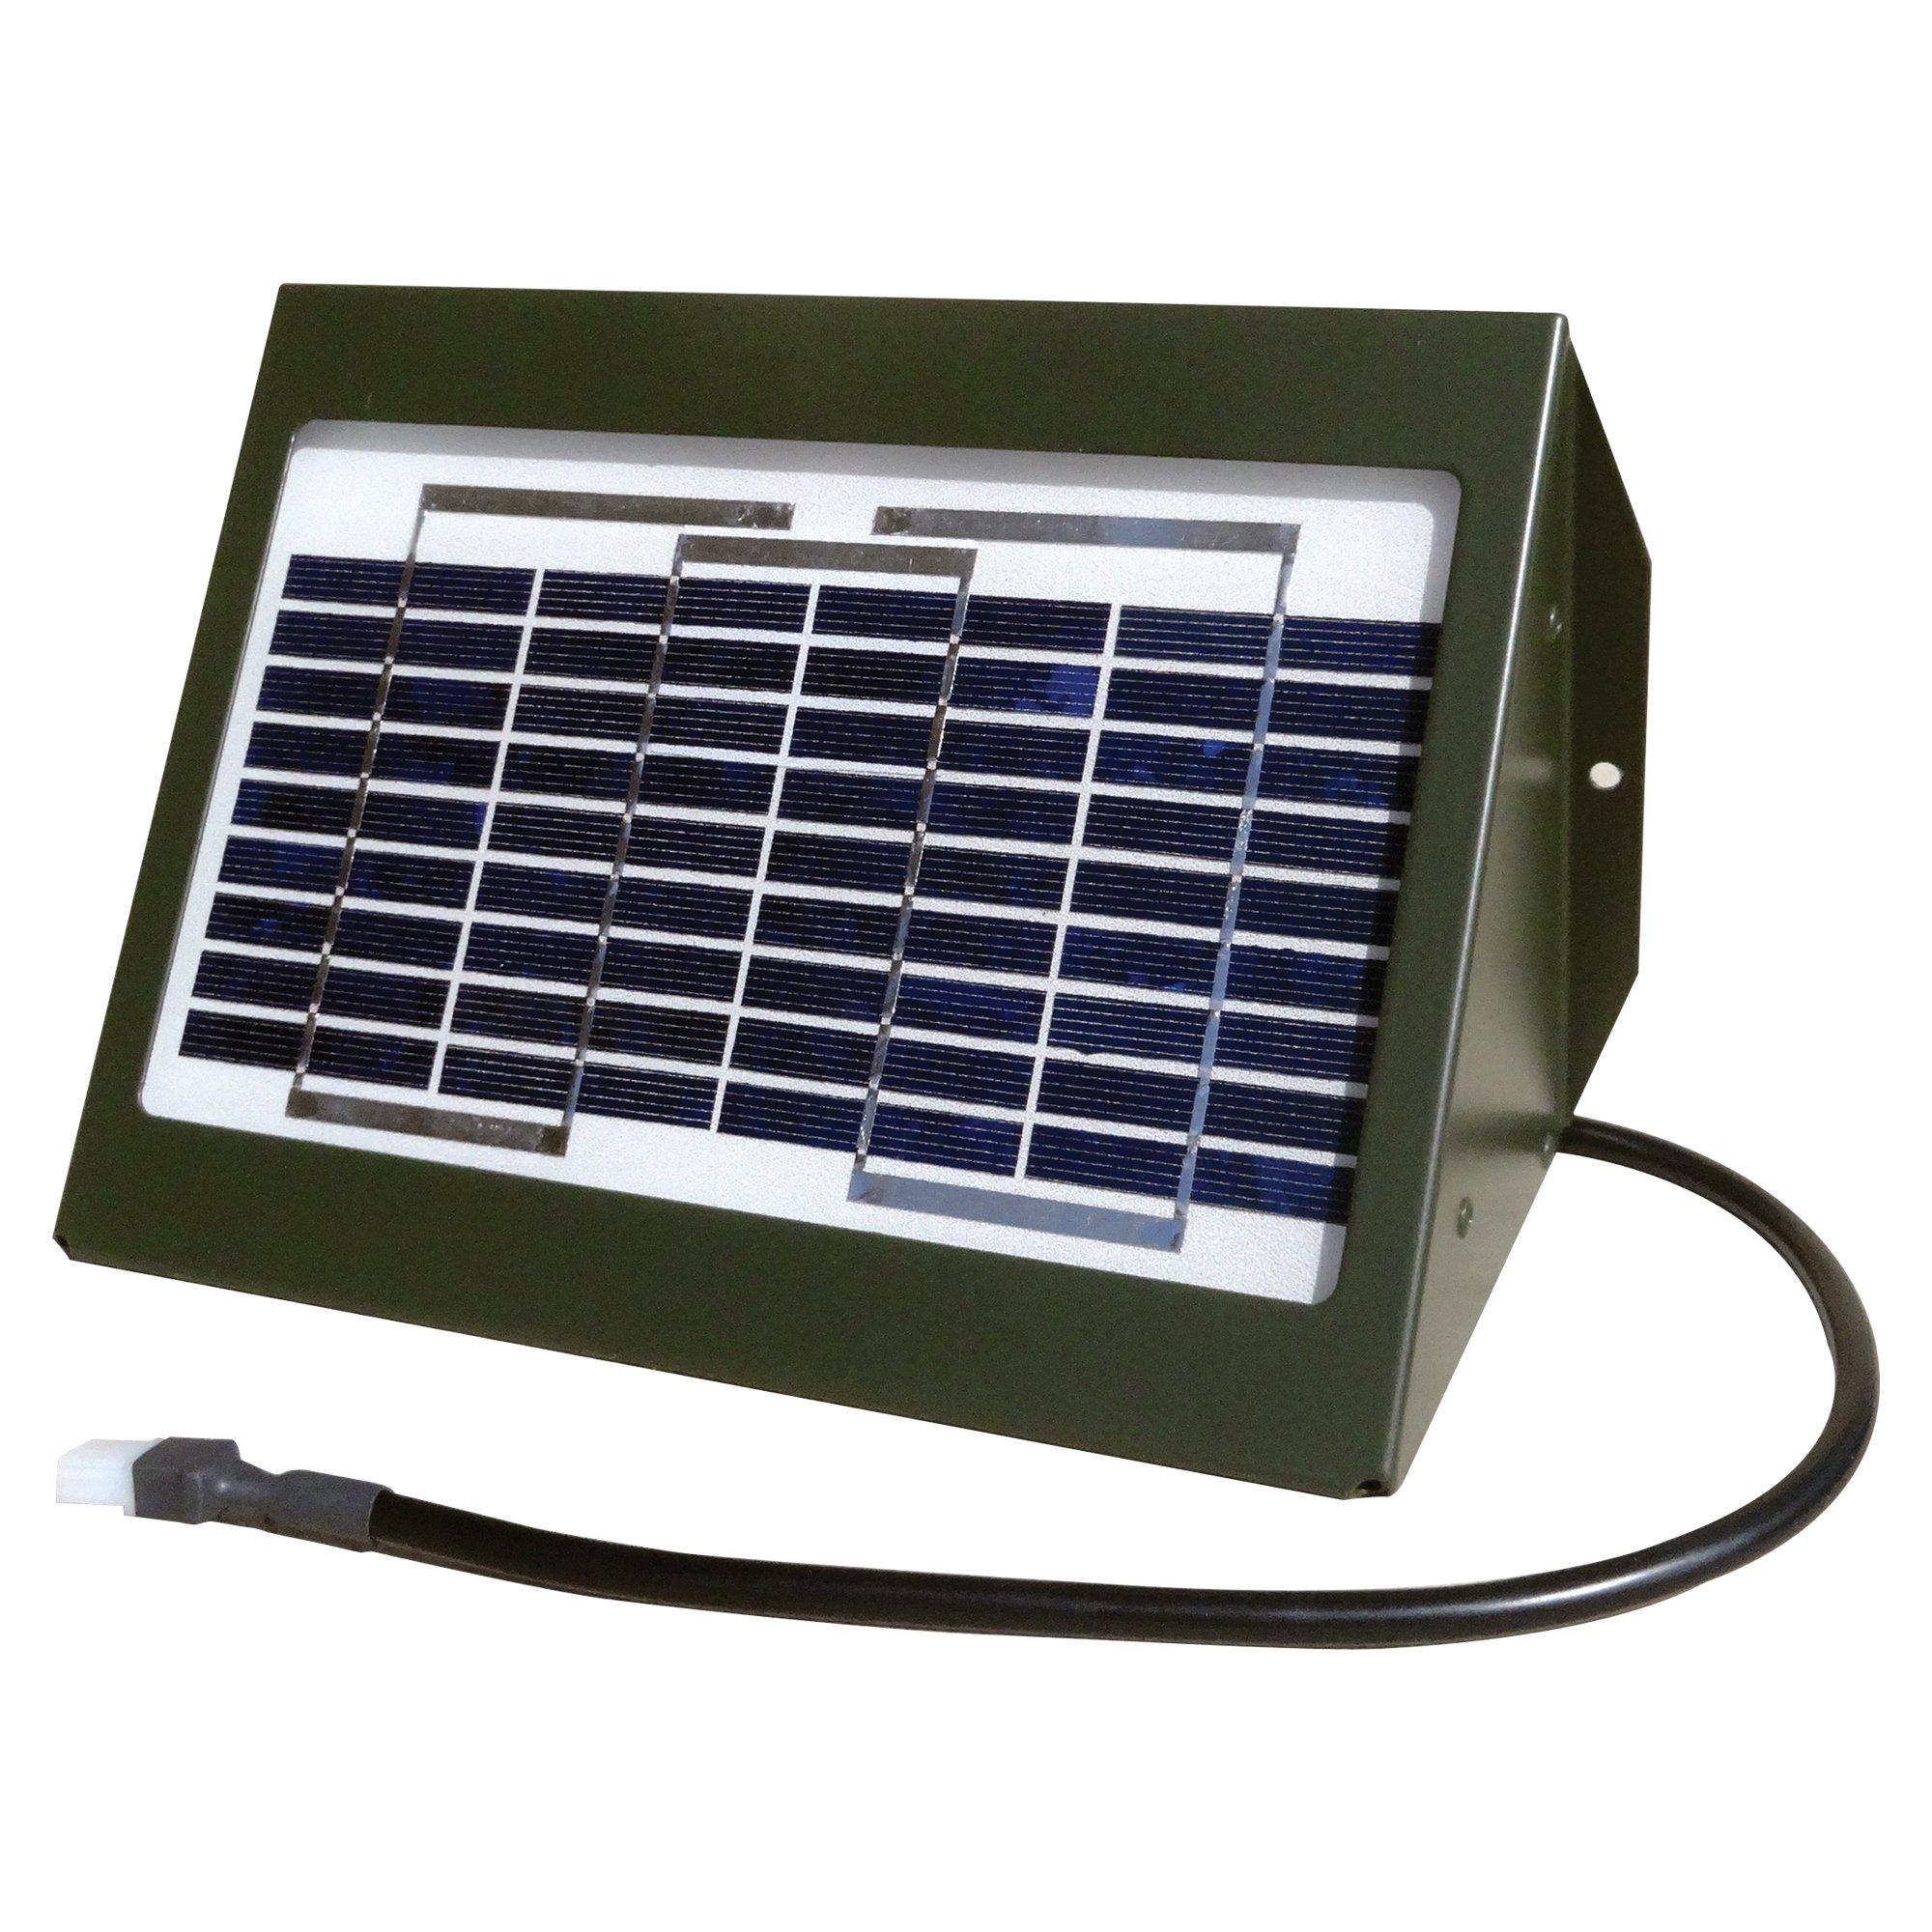 Texas Hunter 2-Watt Solar Charger for Directional Feeders - Model SP2W